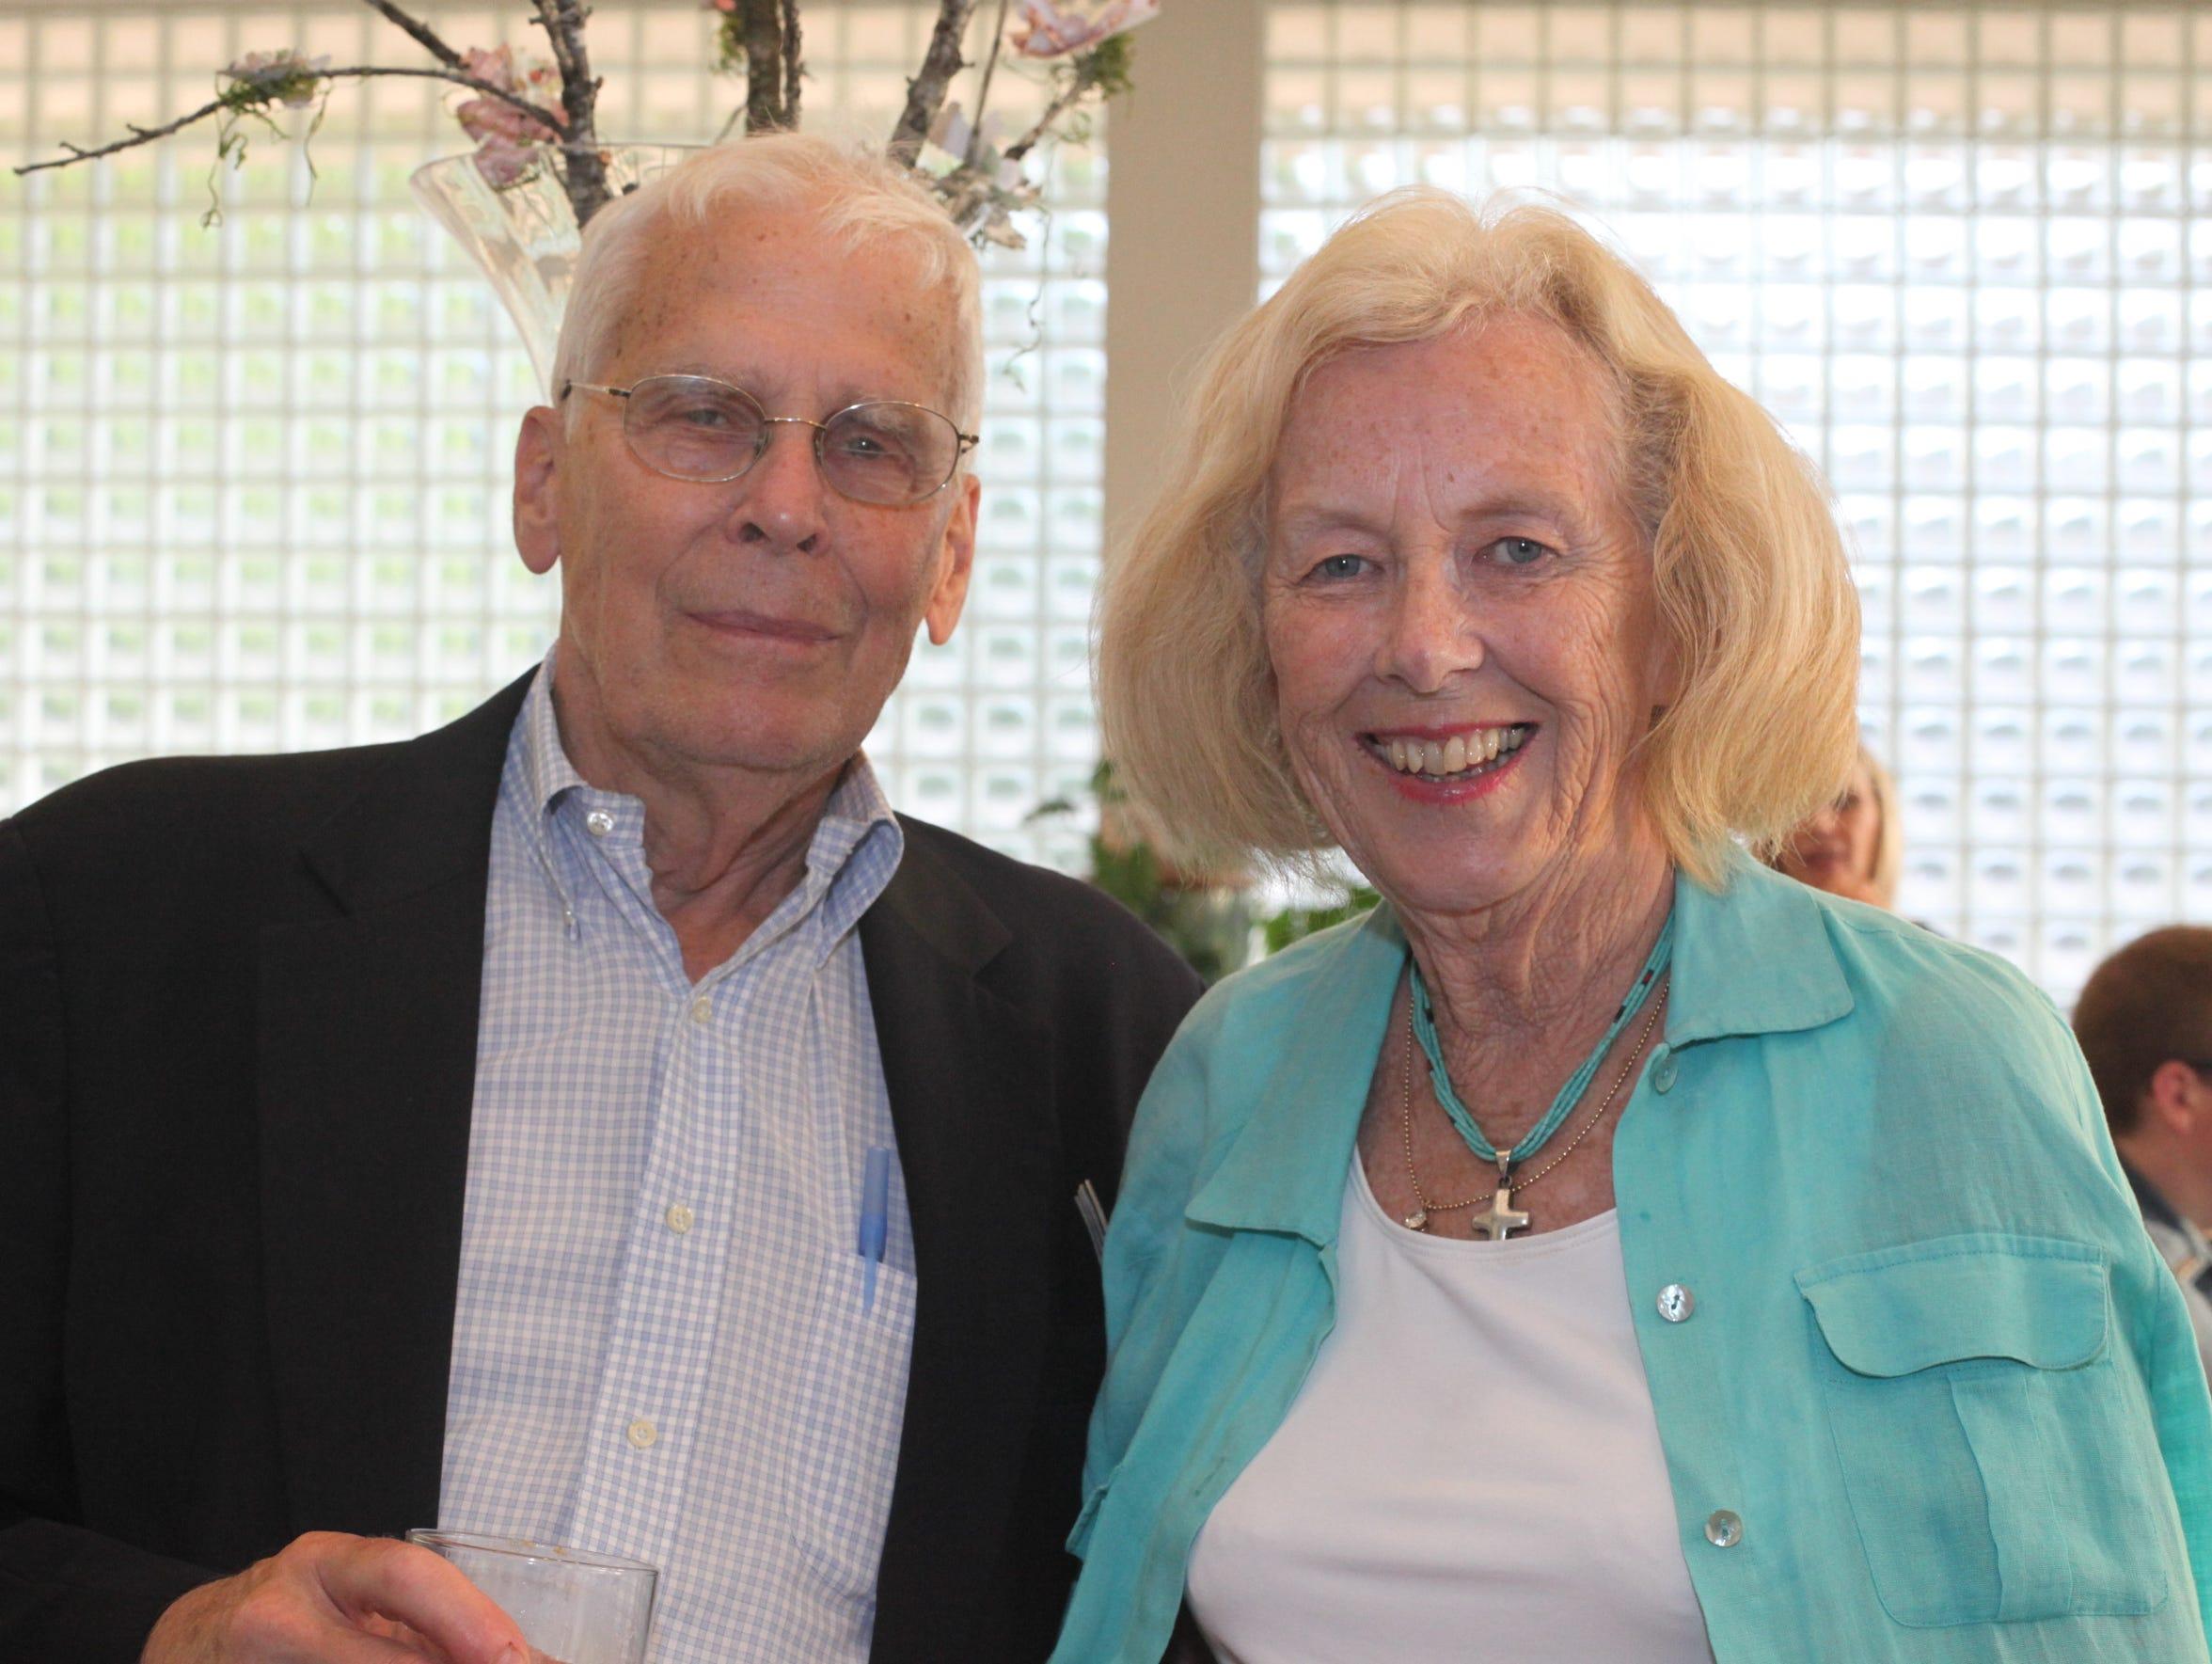 Dr John Bentley and Founder Roseann Bentley at An Evening